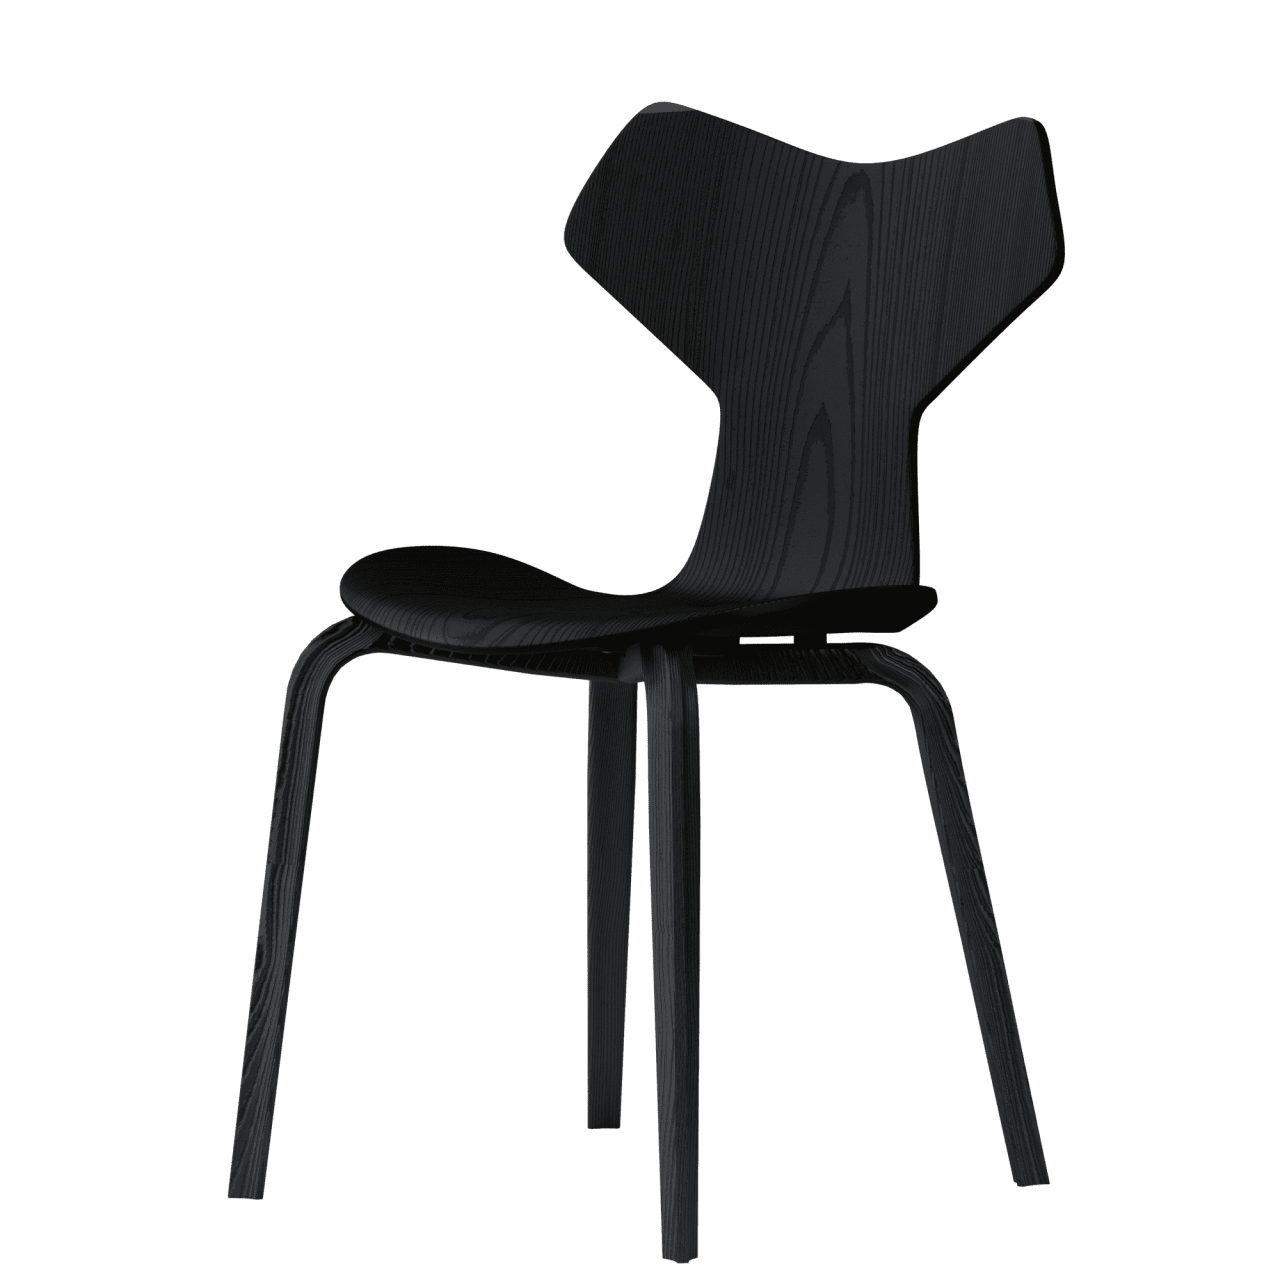 3130 Grand Prix Stuhl mit Holzgestell